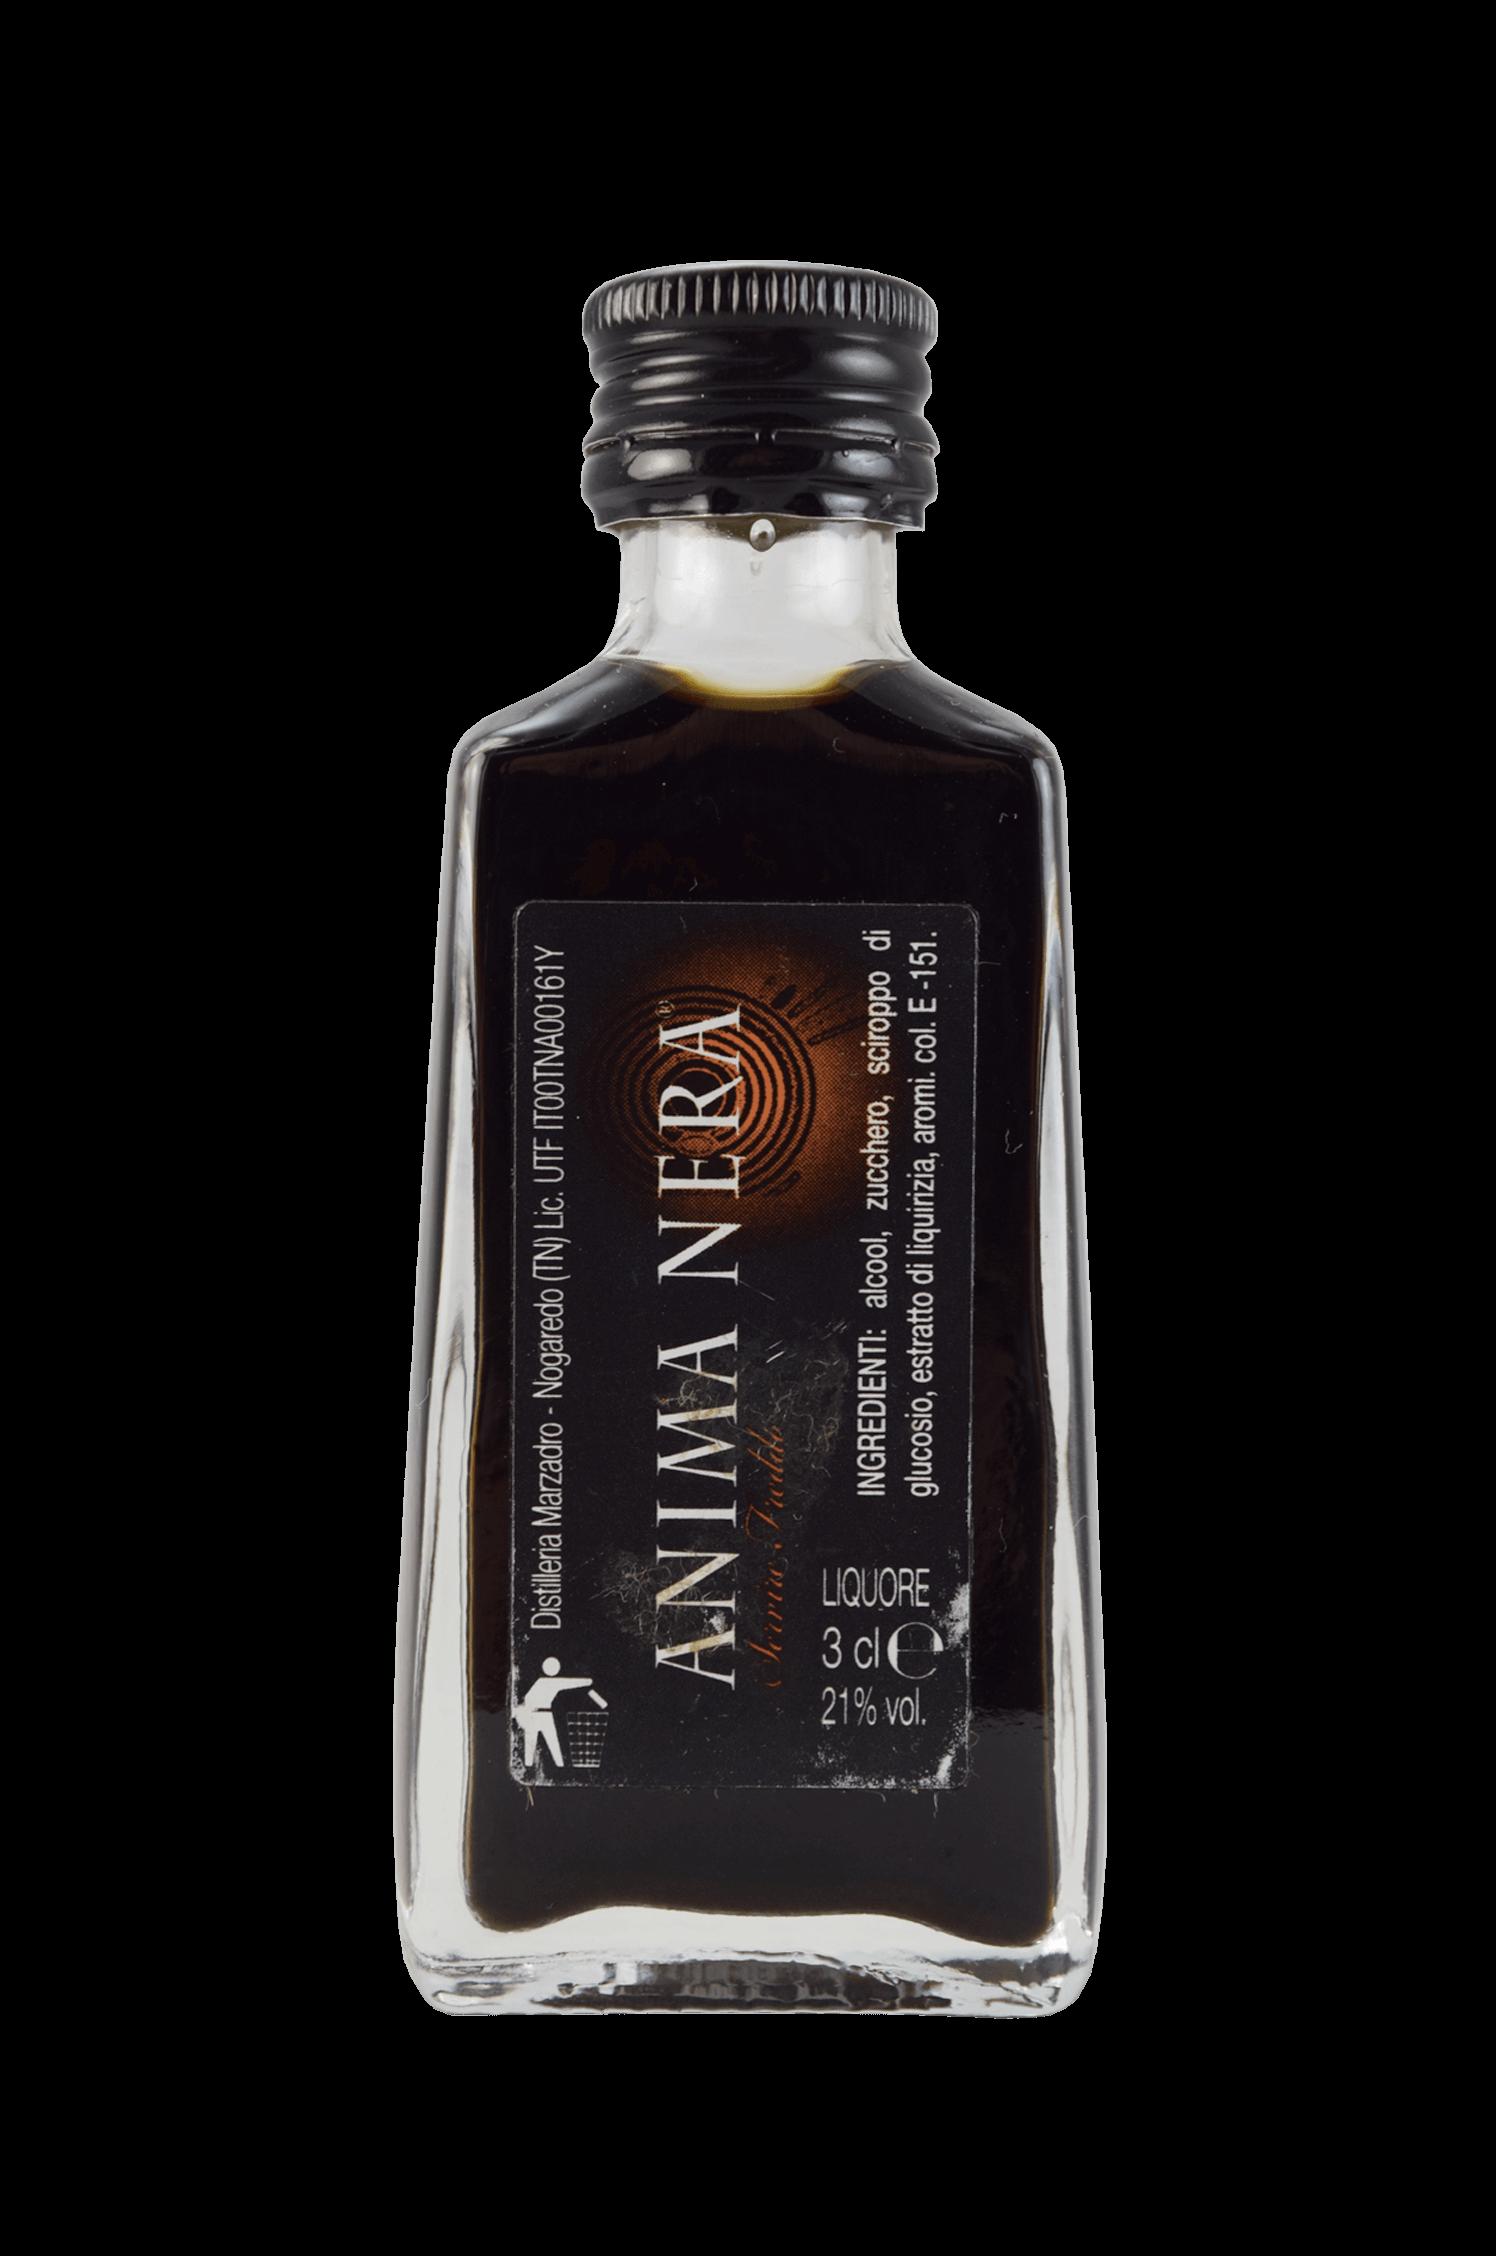 Anima Nera Liquore